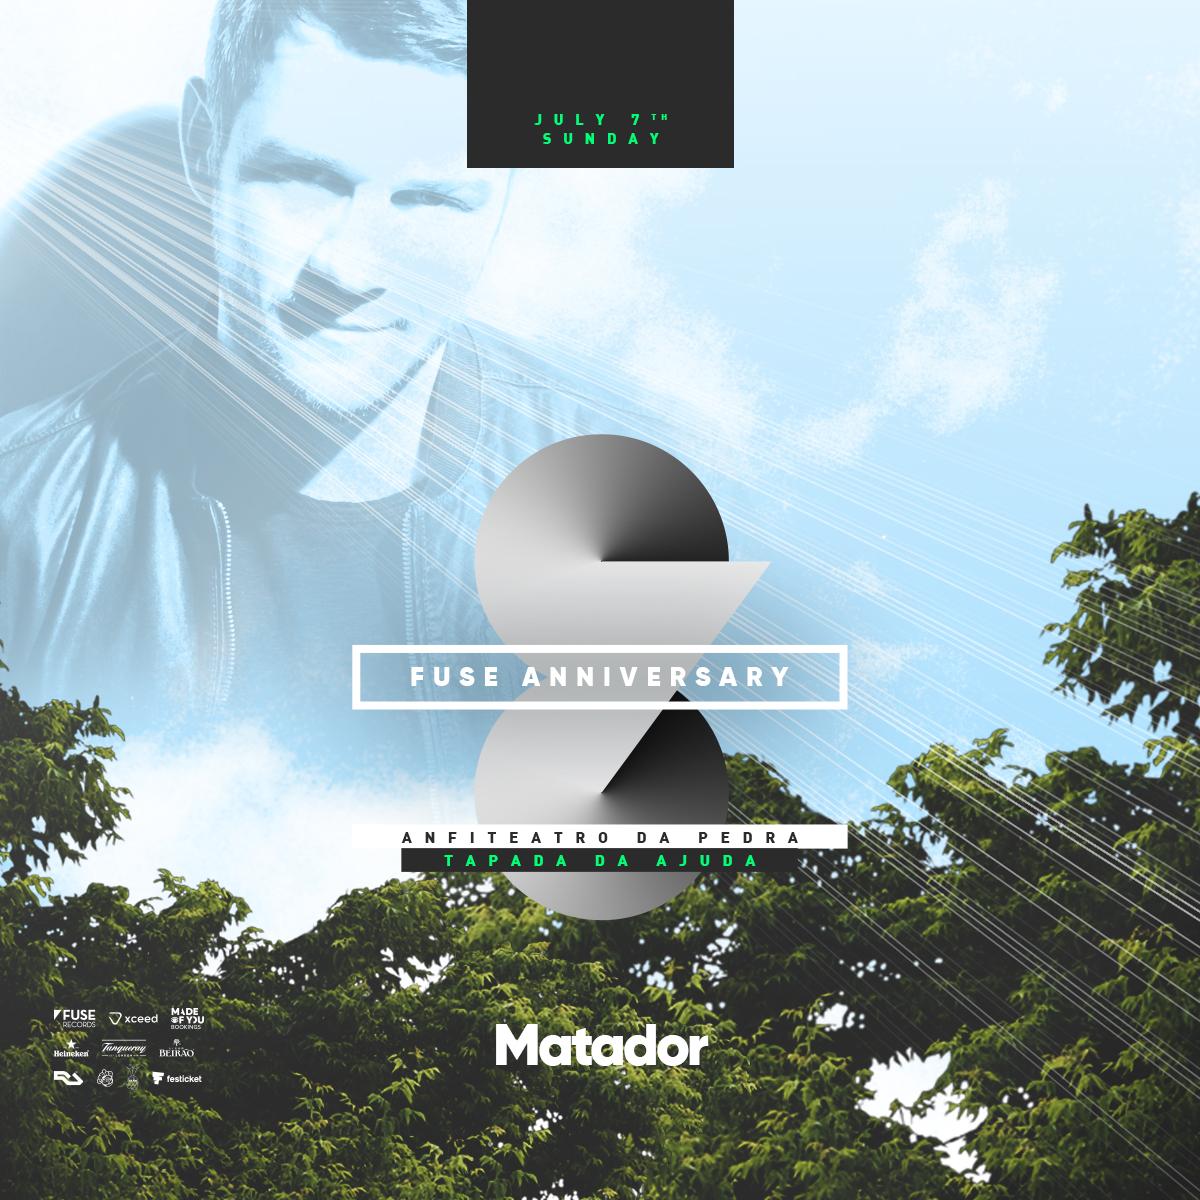 FuseMatine_aniversario_Profile_Matador.jpg